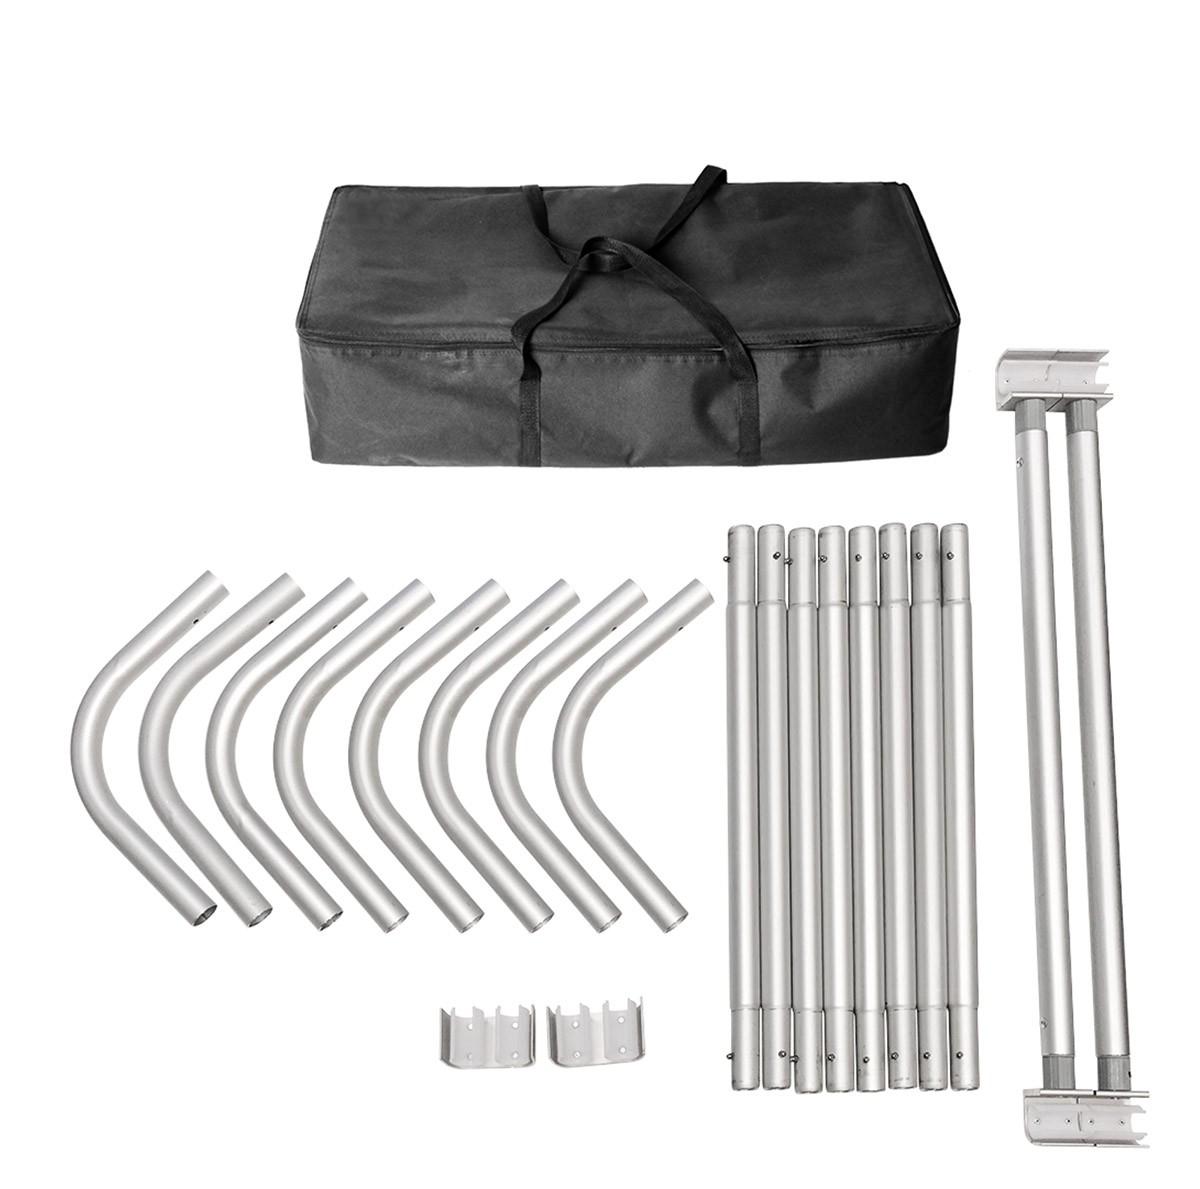 Aluminum Tube Fabric A-Frame 3x3